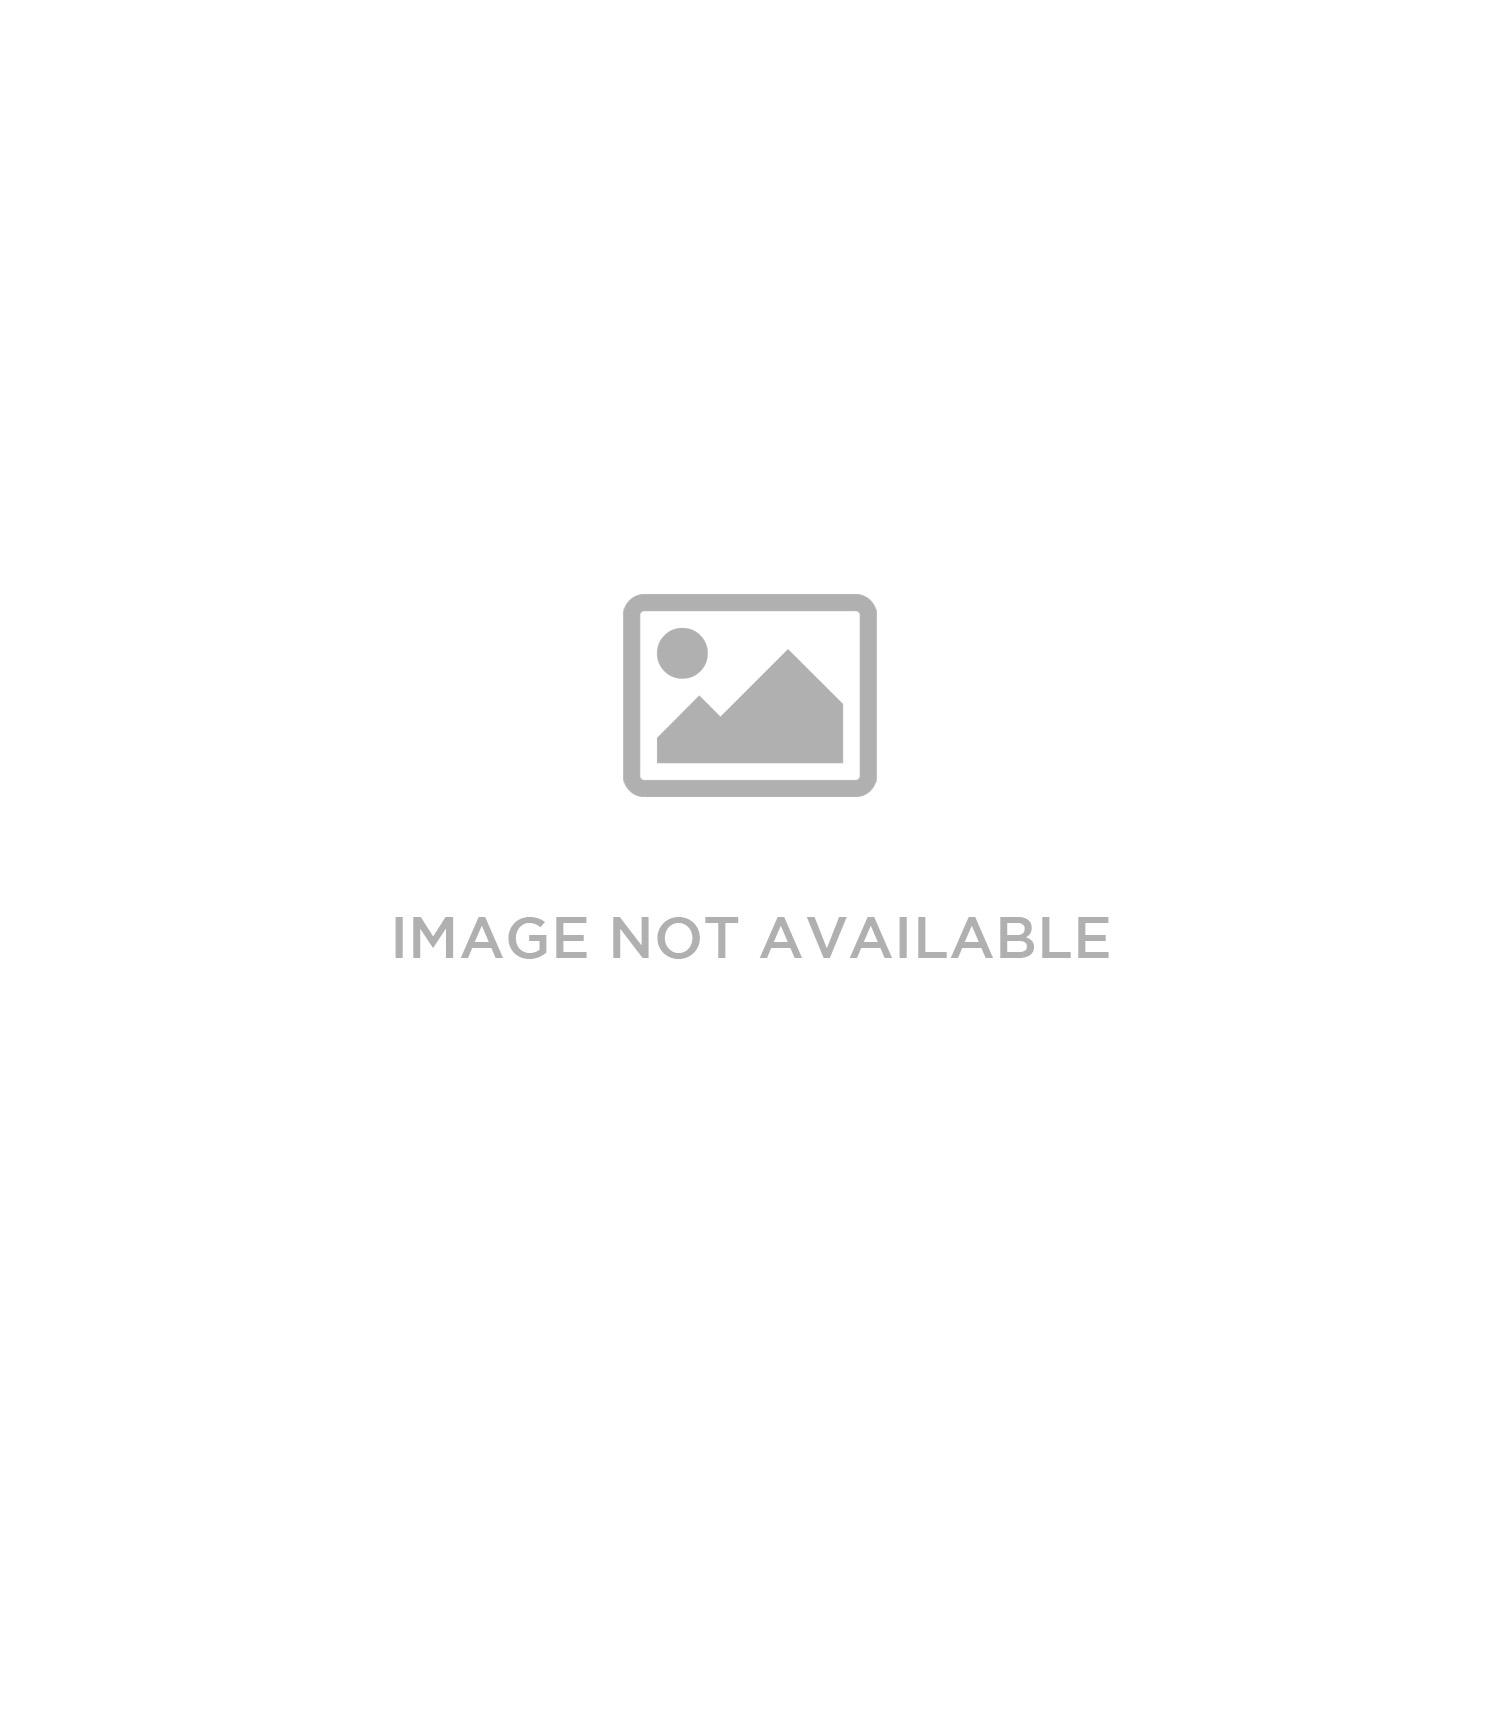 BELLA+CANVAS® TRIBLEND RACERBACK LADIES' TANK. 8430